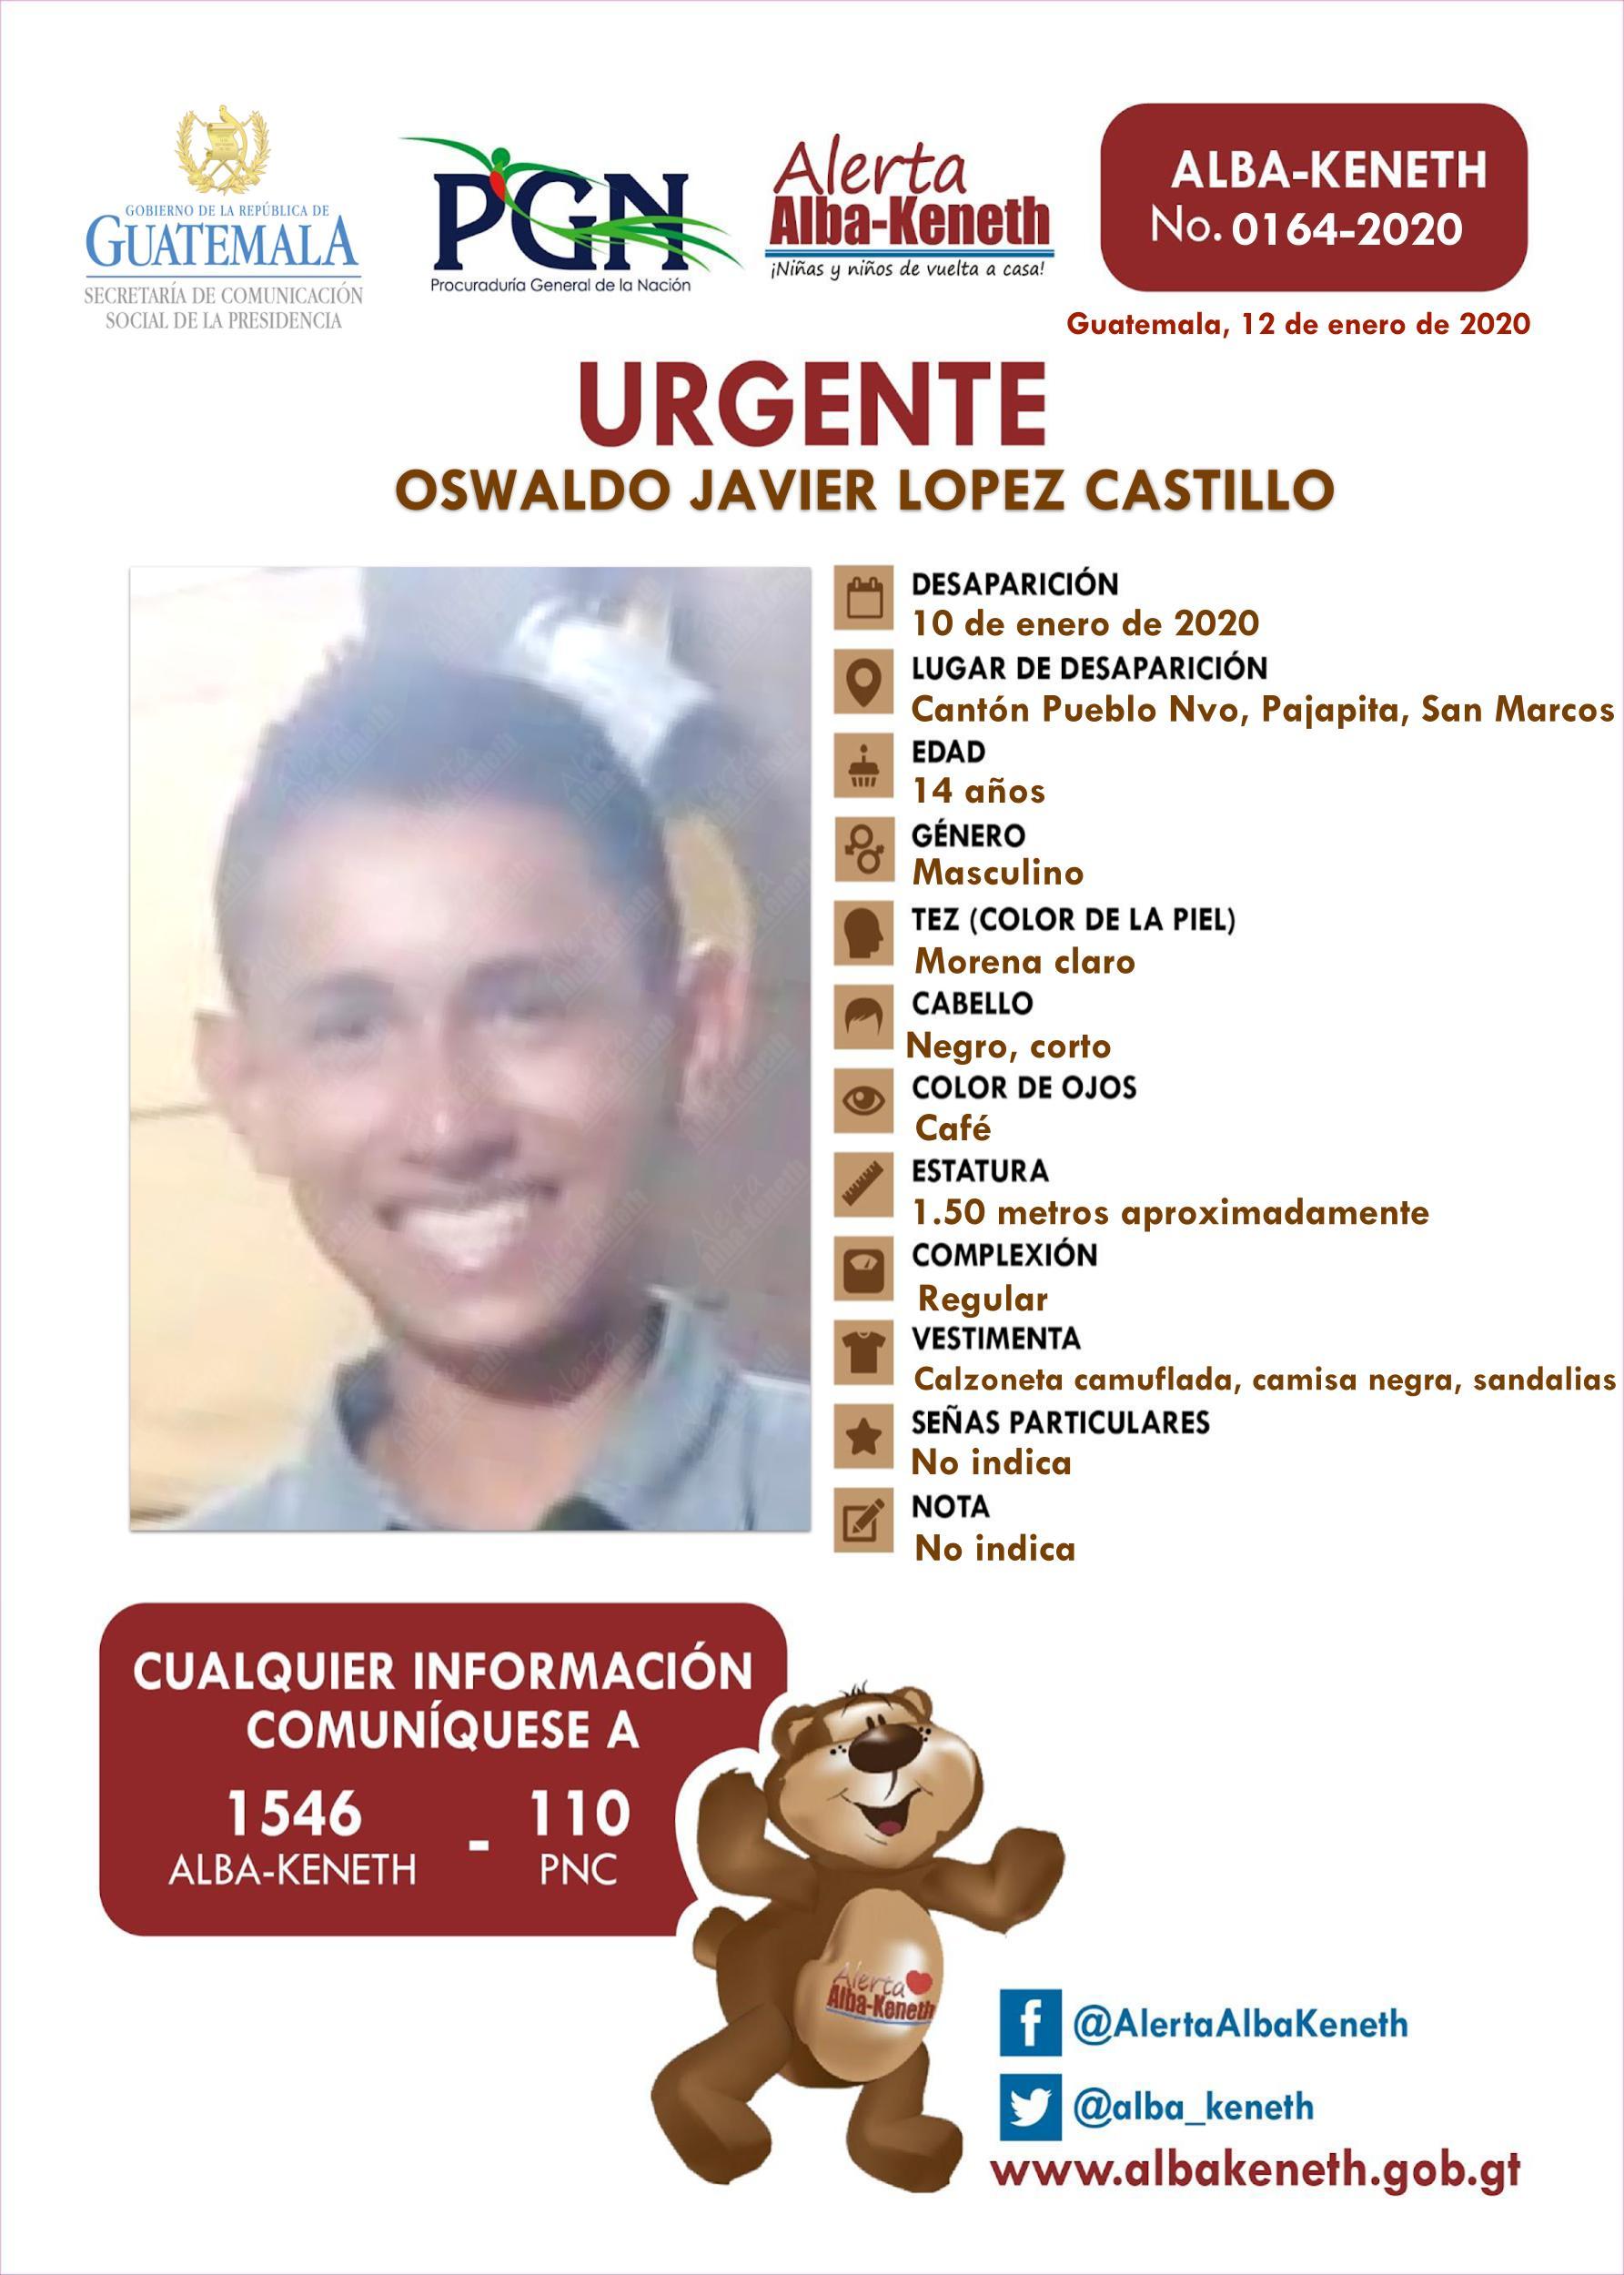 Oswaldo Javier Lopez Castillo